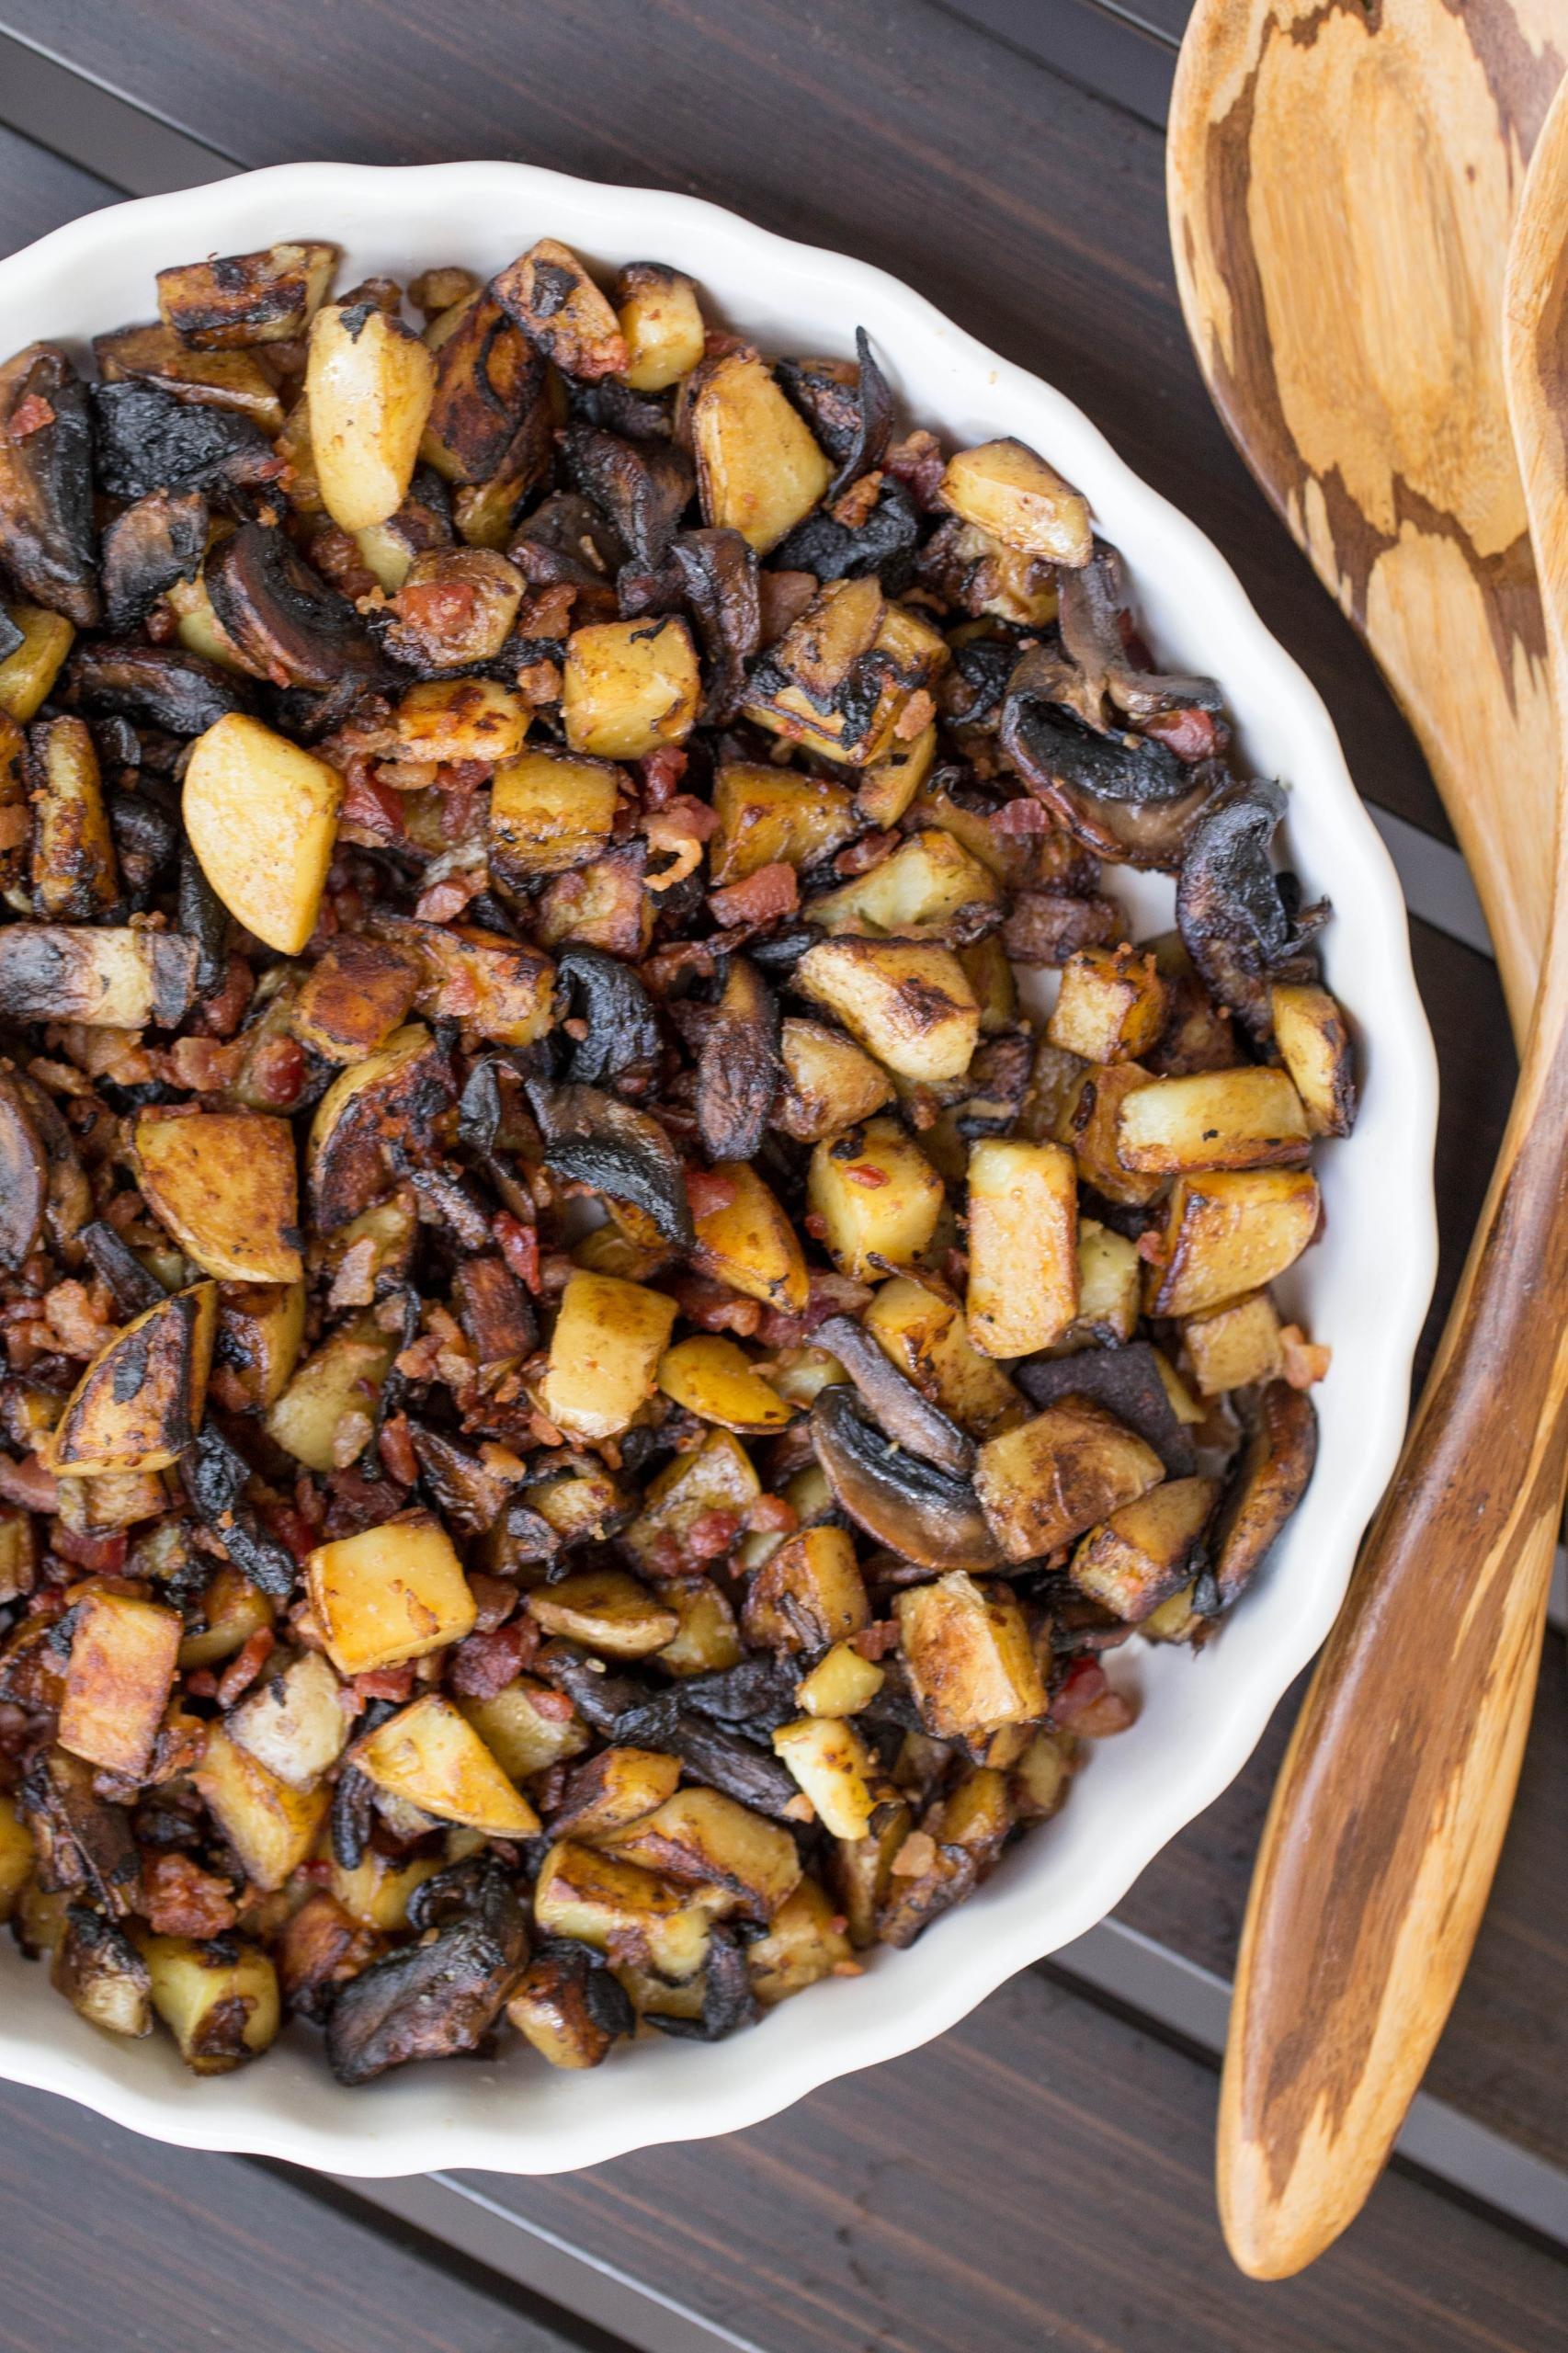 Potato Mushroom Breakfast in a serving tray